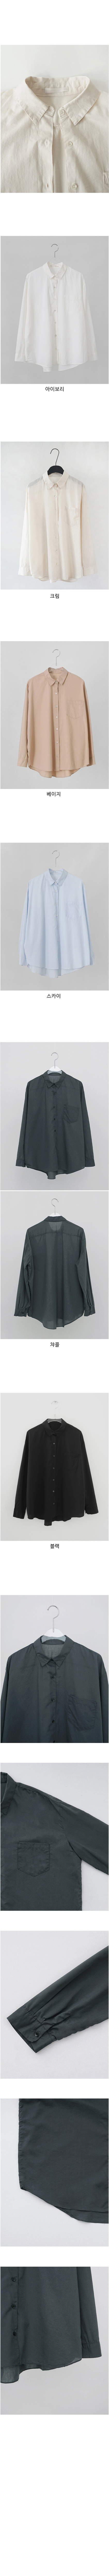 fundamental silhouette shirt